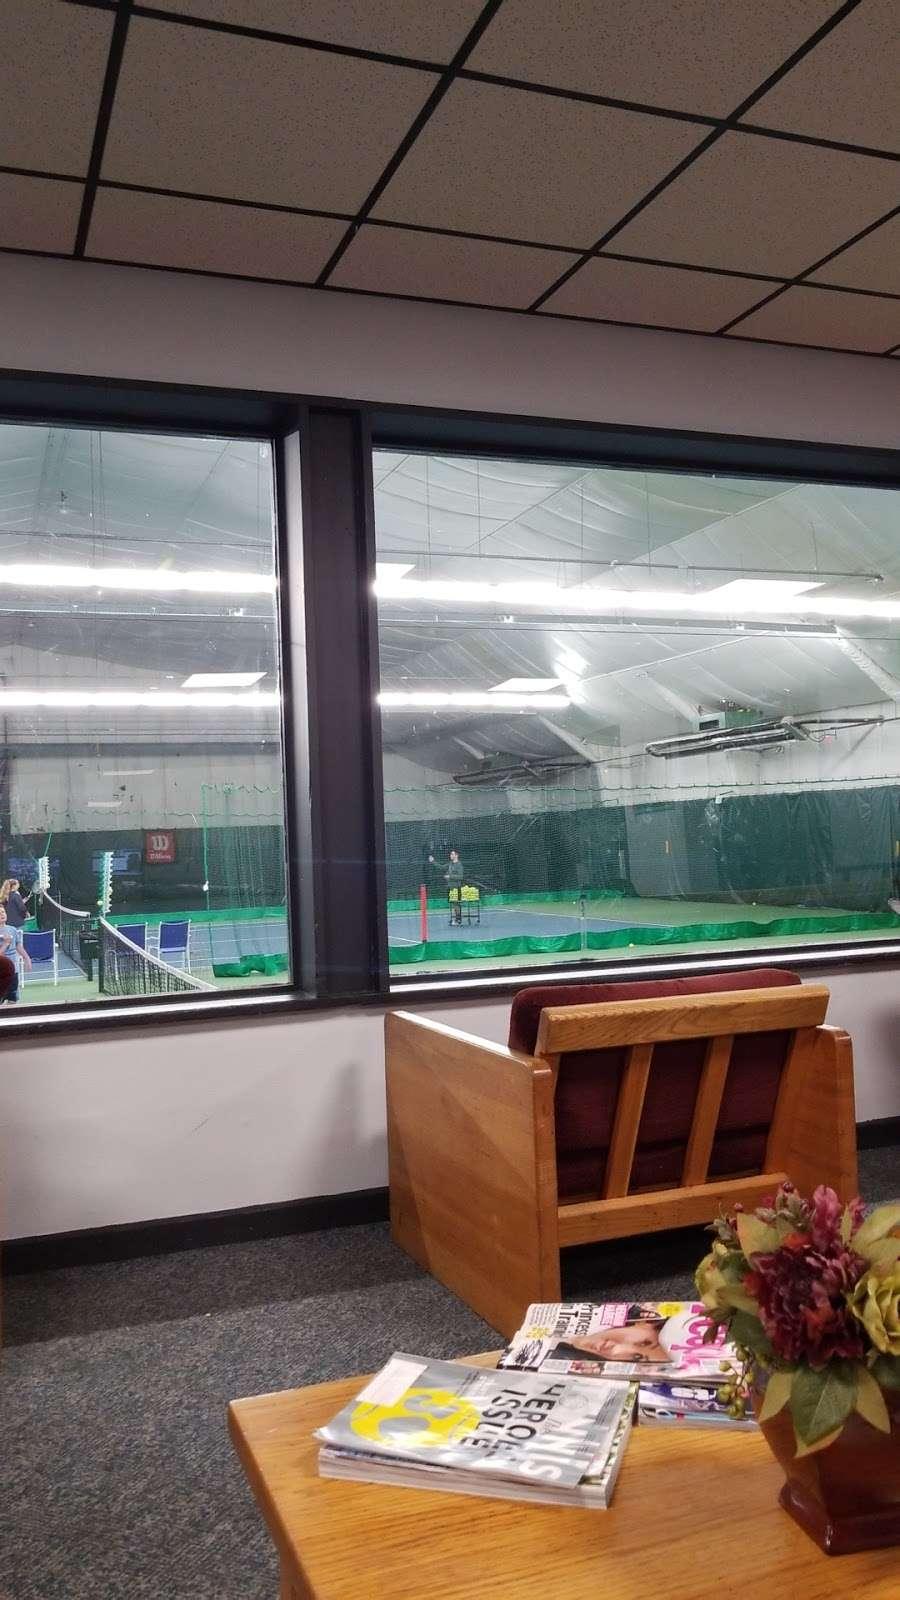 Sparta Athletic Club - gym    Photo 1 of 5   Address: 115 S Sparta Ave, Sparta Township, NJ 07871, USA   Phone: (973) 729-9141